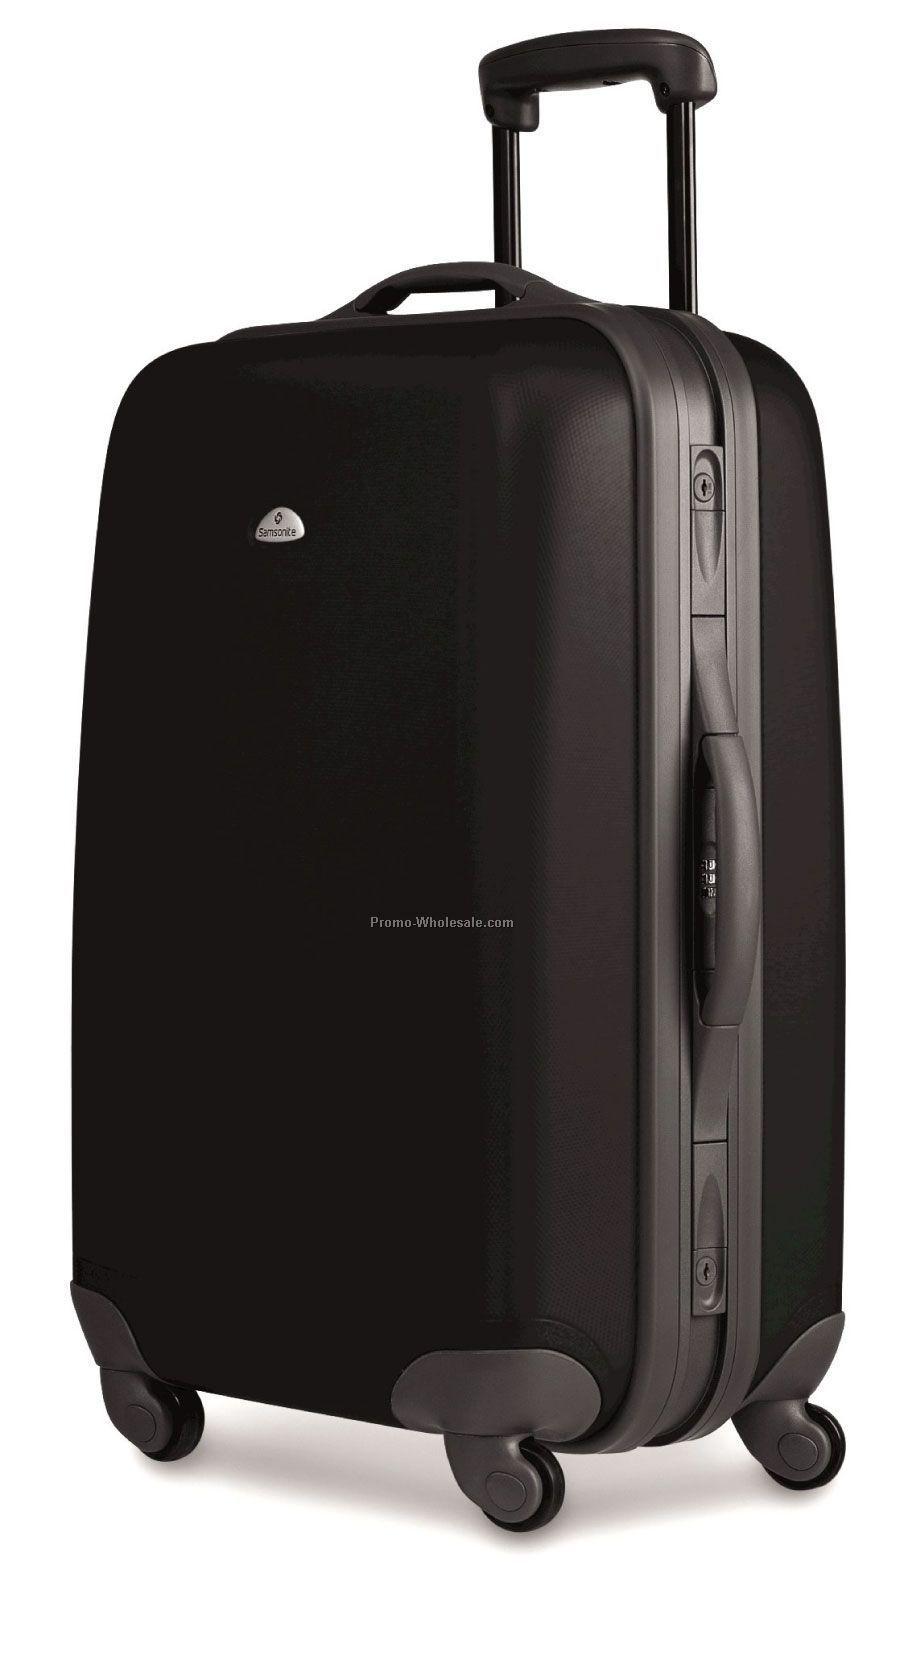 26 Spinner Upright Cruiseair Suitcase